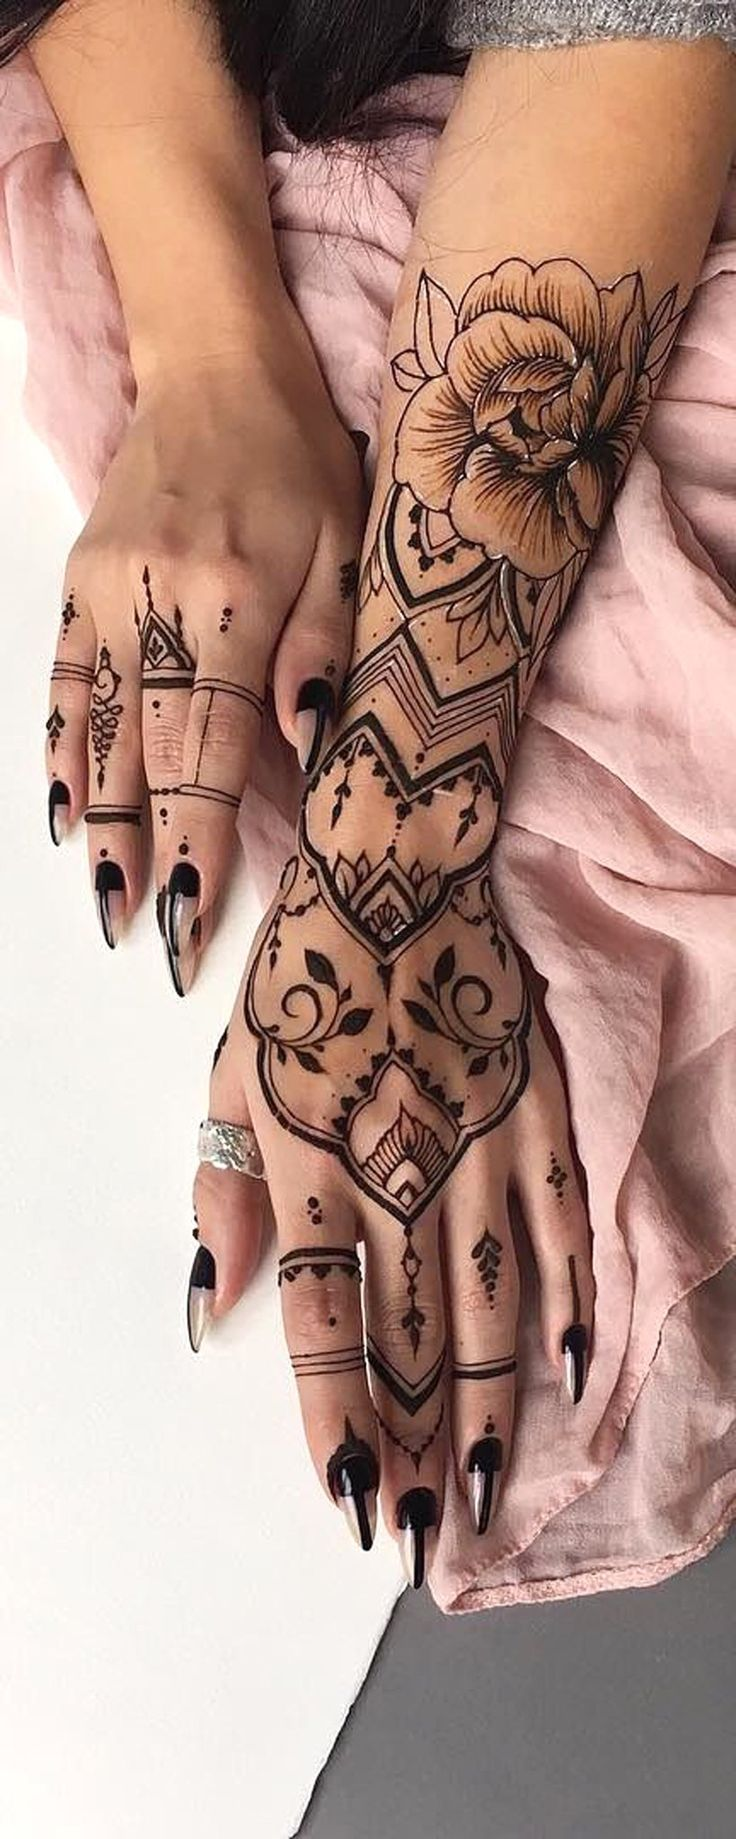 Black Henna Tribal Bohemian Hand Tattoo Ideas For Women Realistic